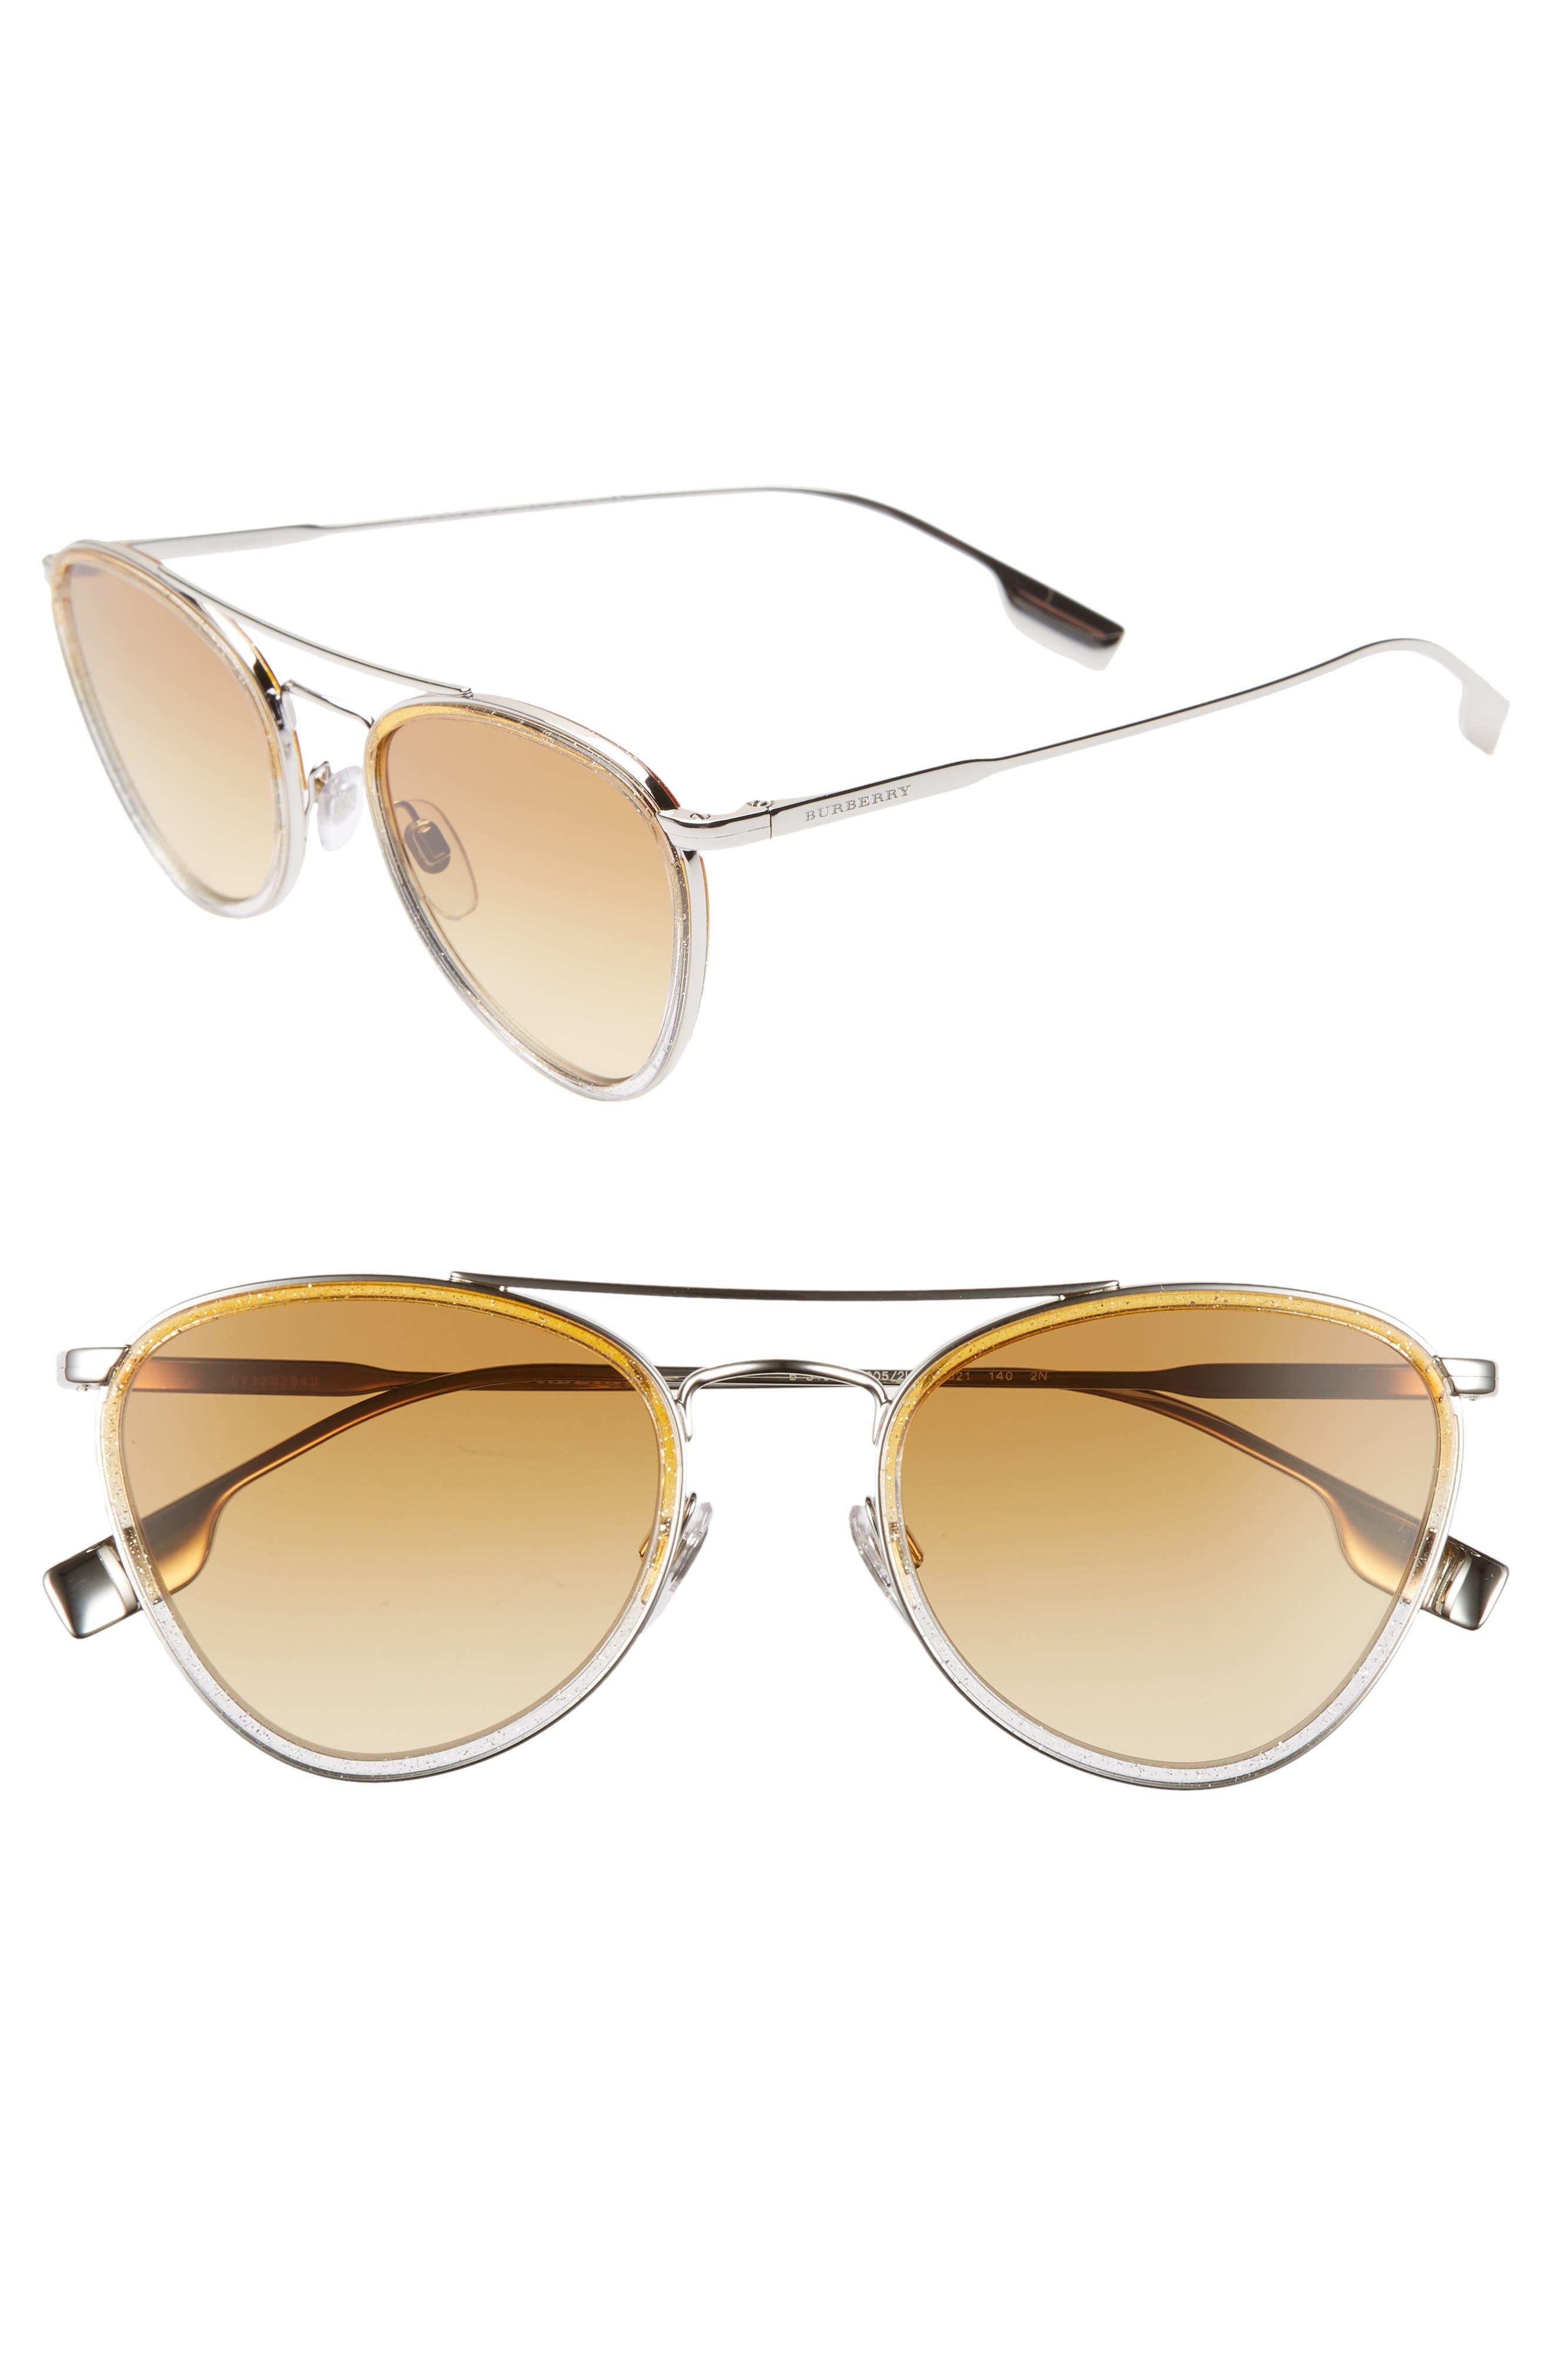 9f461481f9a burberry sunglasses